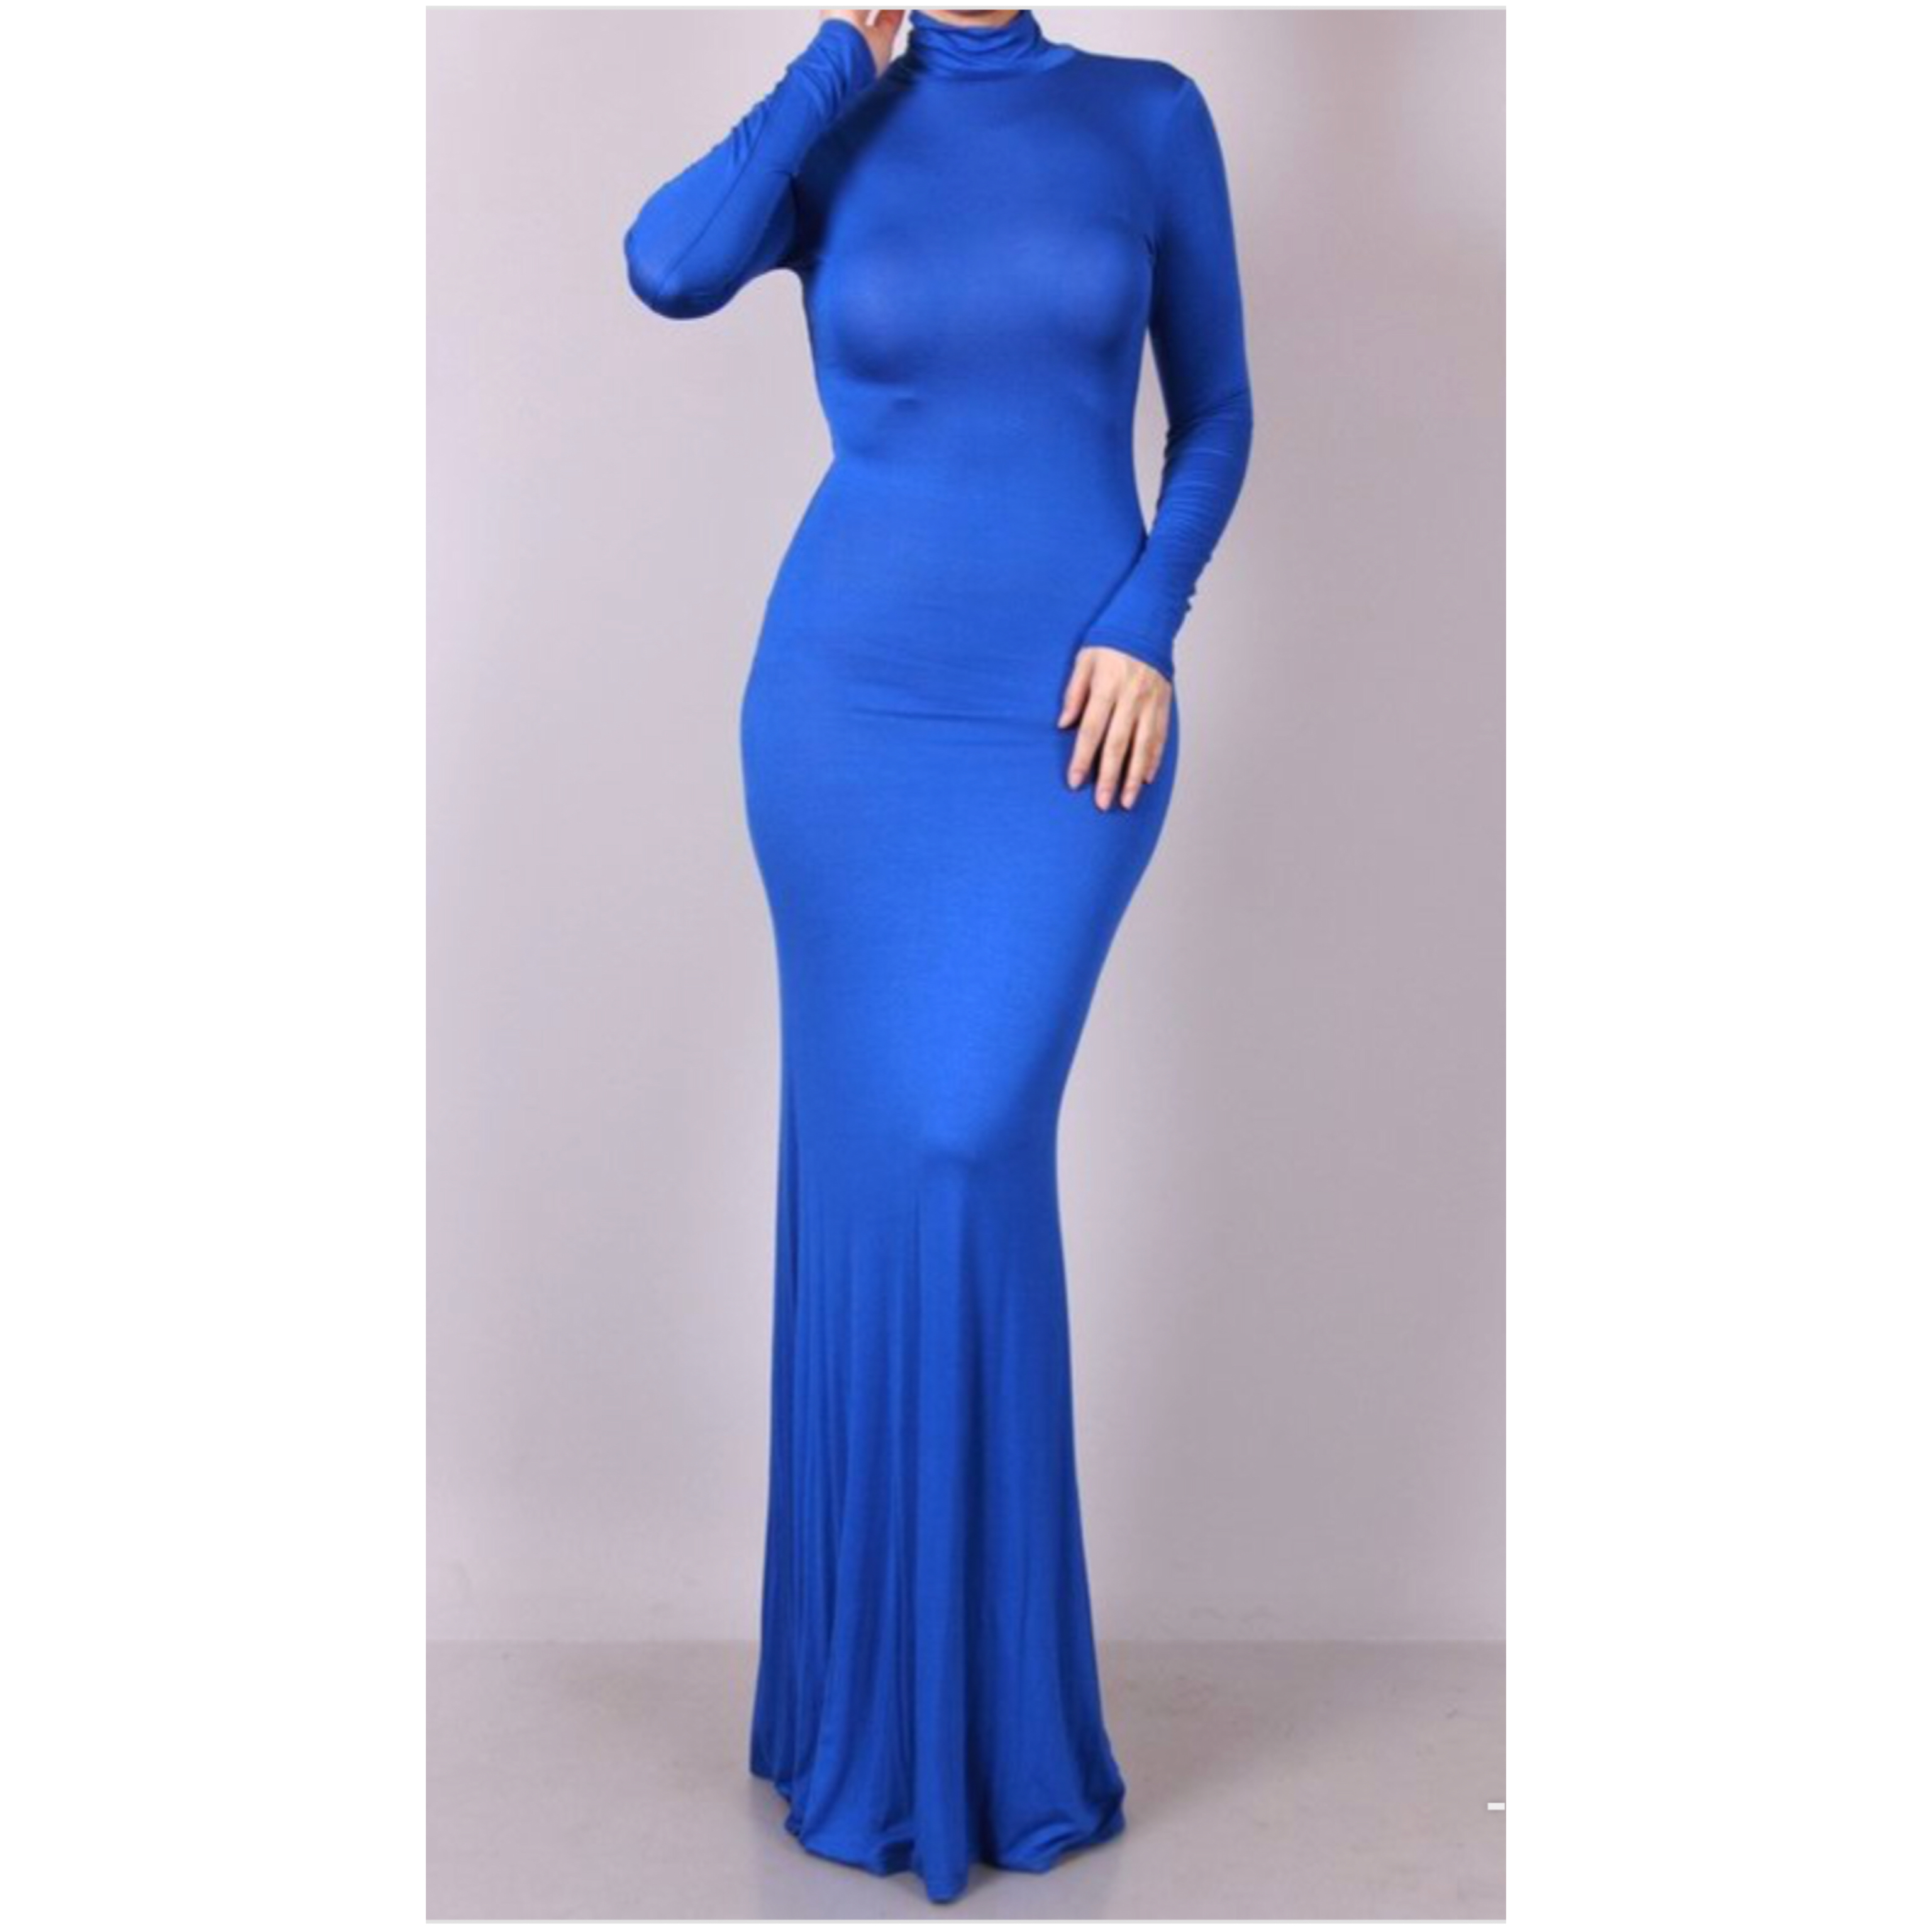 Turtleneck Maxi dress · ~ Posh Picks ~ · Online Store Powered by ...